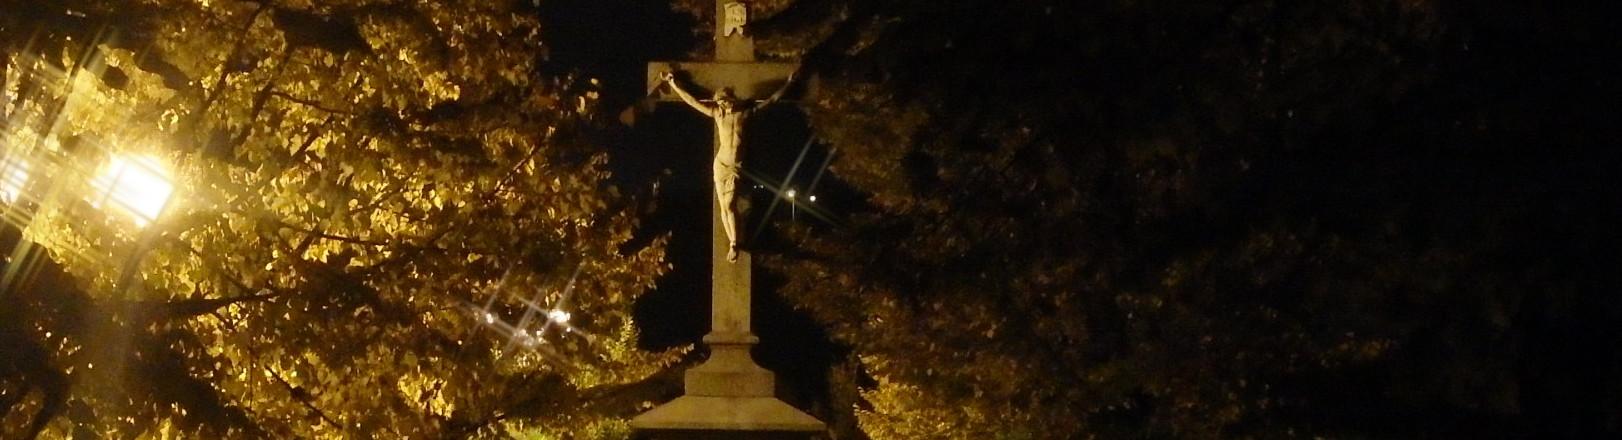 Ústřední hřbitov Slezská Ostrava ahornické hroby